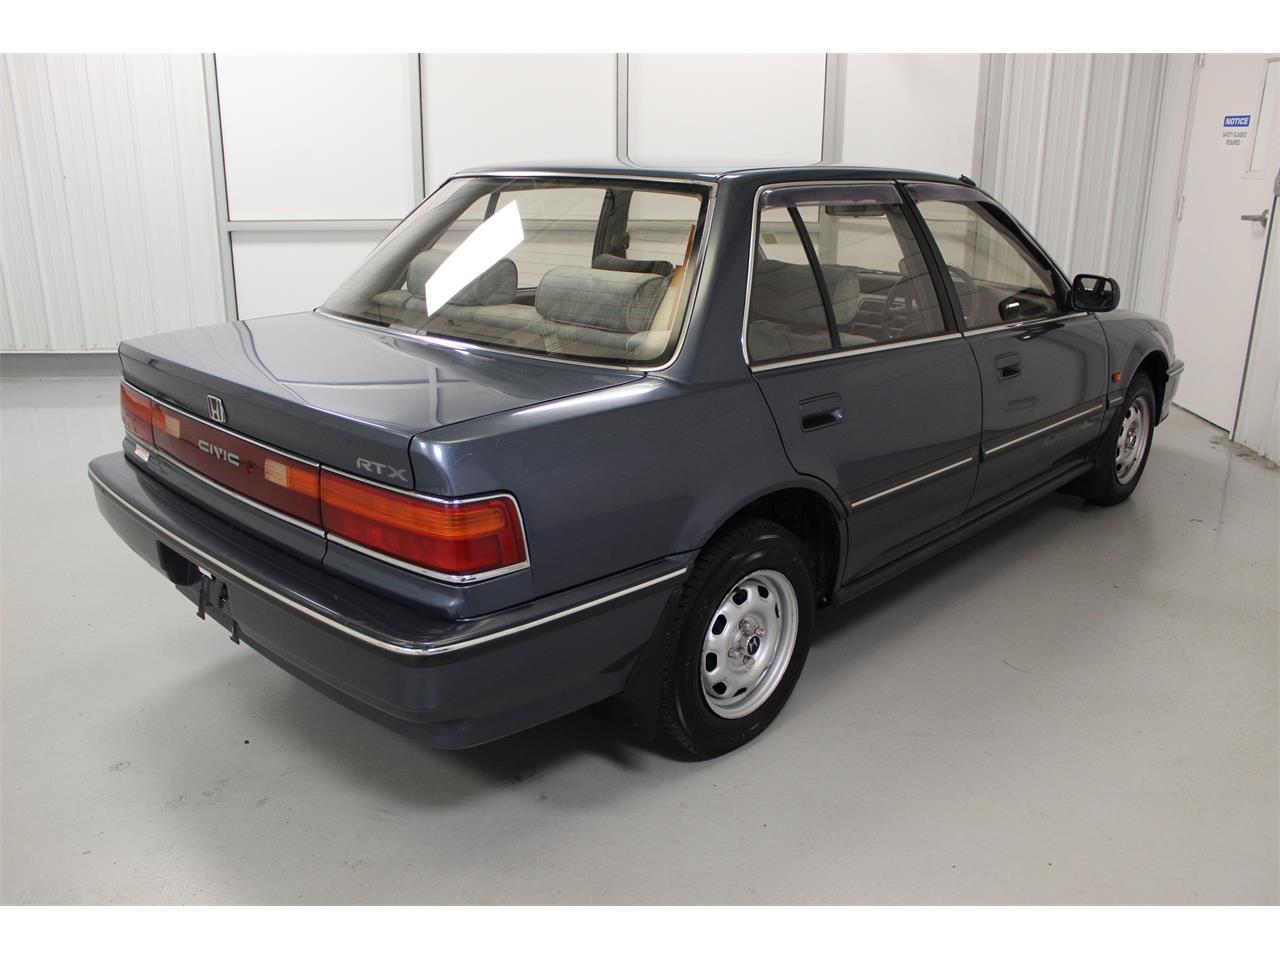 1990 Honda Civic for Sale   ClassicCars.com   CC-1167921